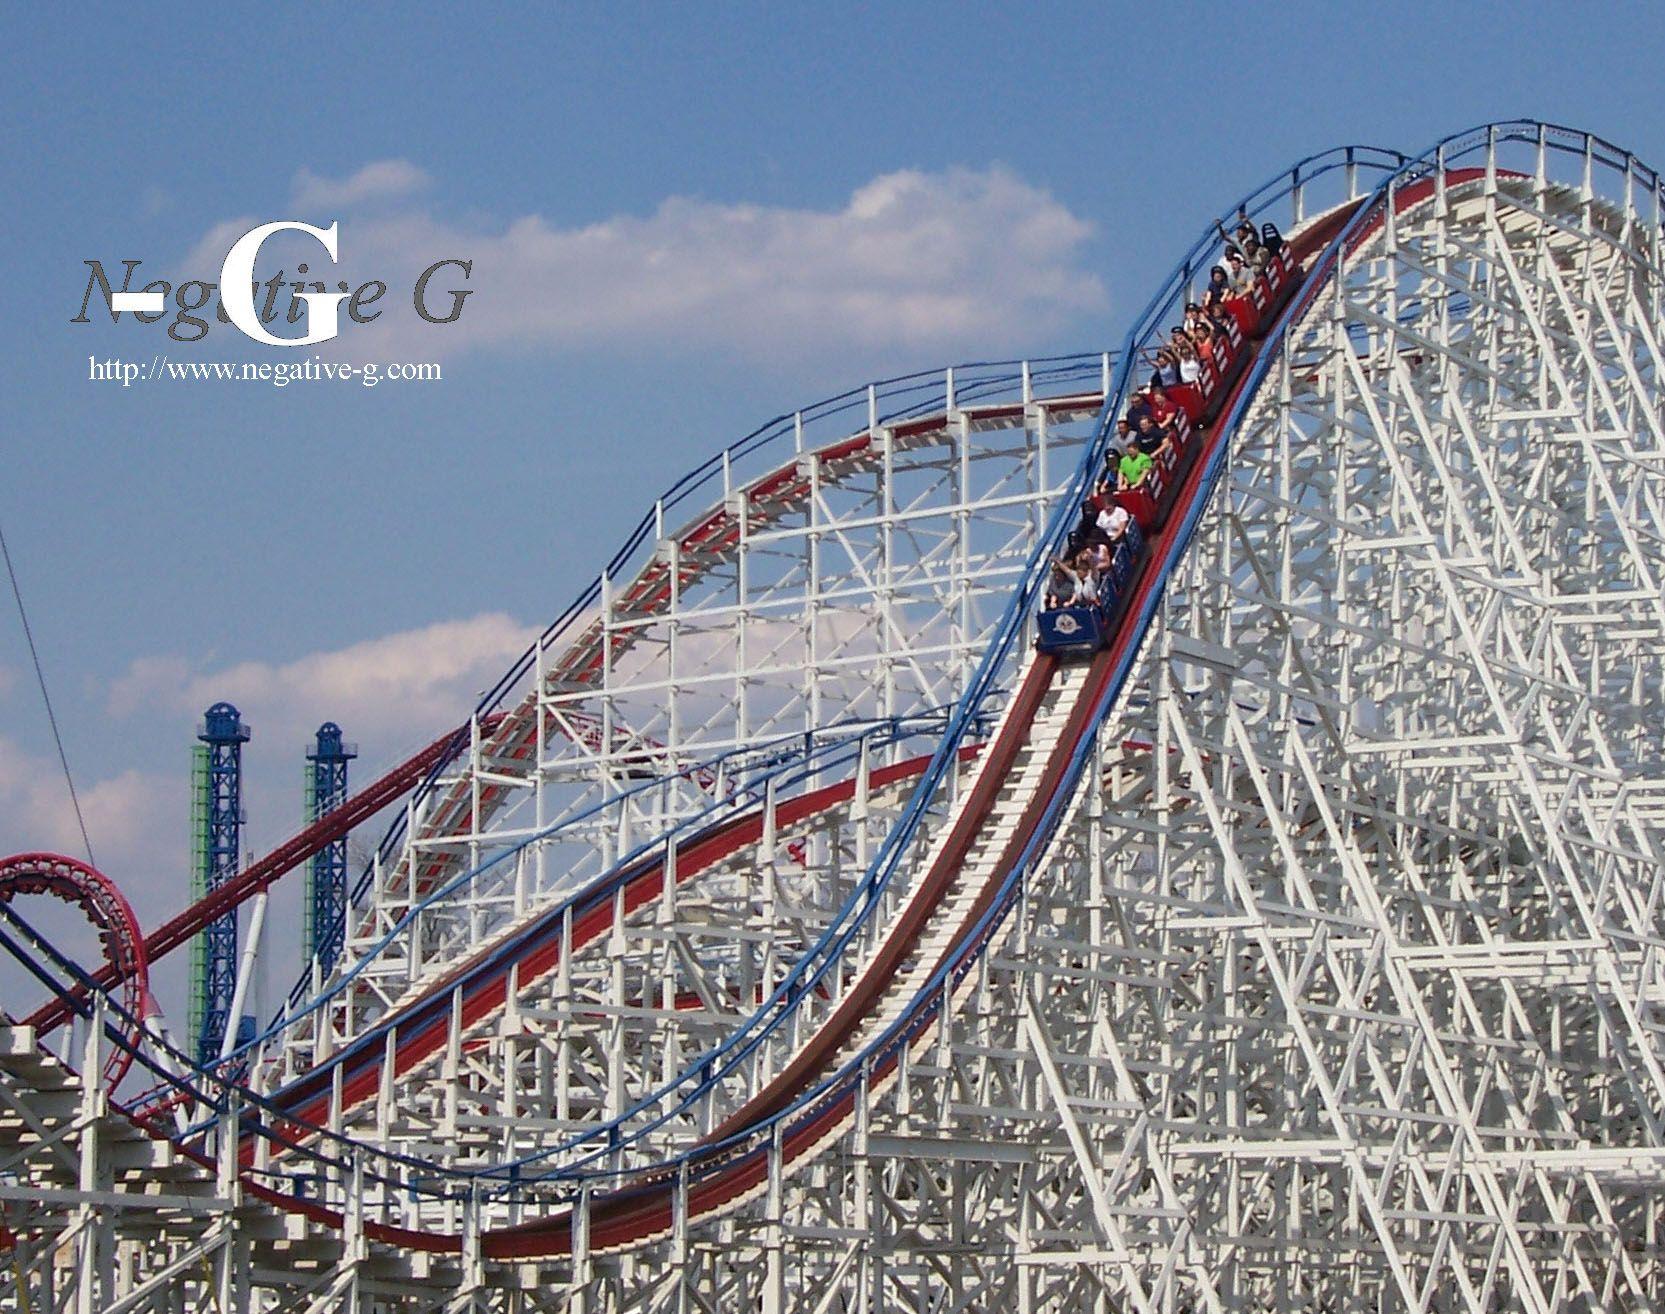 The Great American Scream Machine Six Flags Over Georgia Roller Coaster Amusement Park Rides Best Amusement Parks